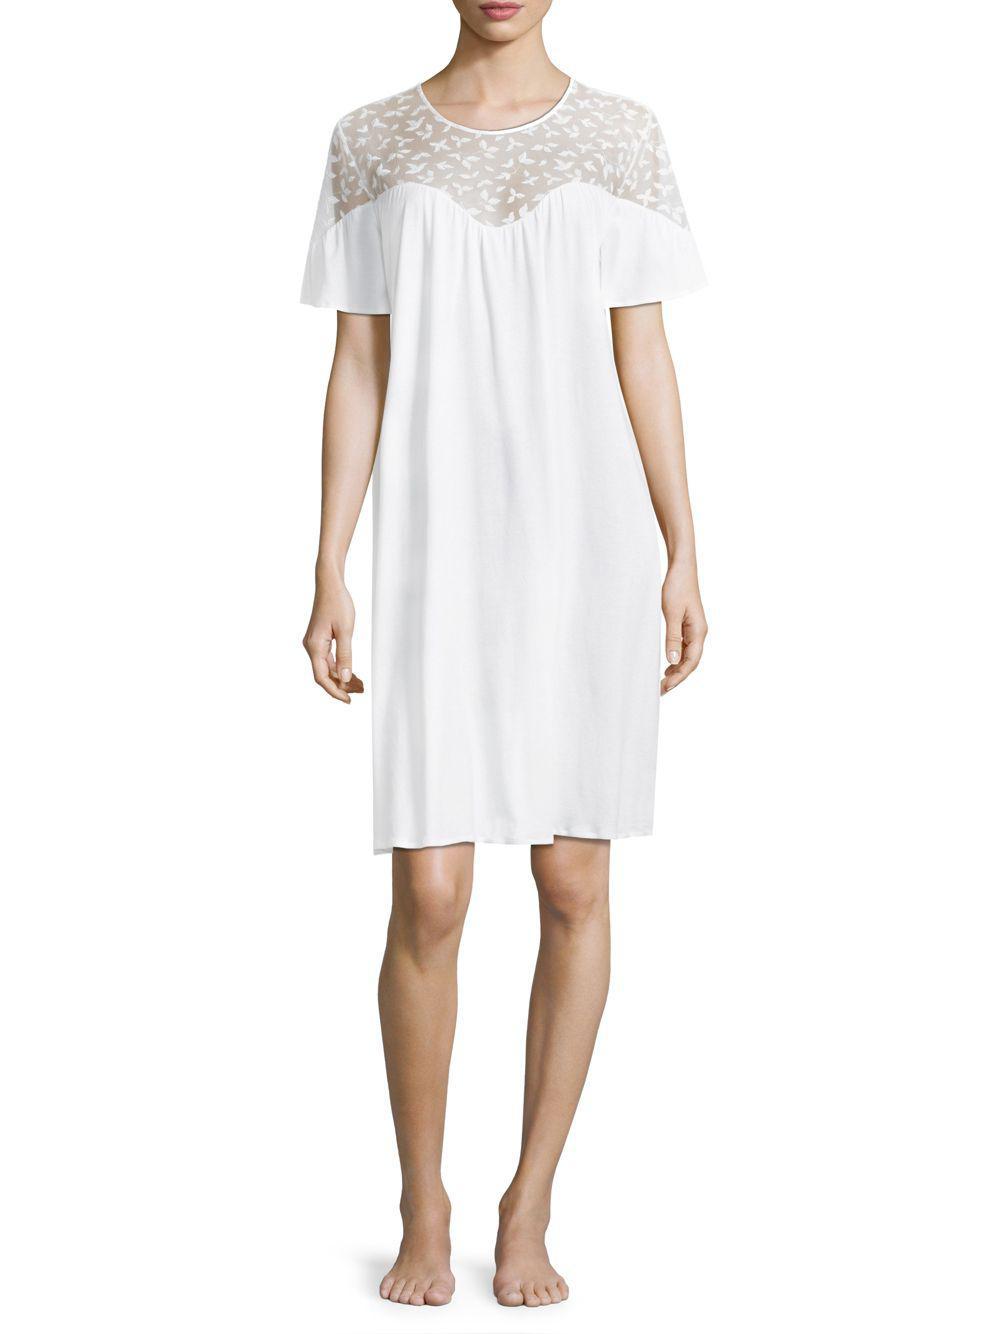 8edc14c3b1 Lyst - Hanro Iris Short-sleeve Cotton Nightgown in White - Save 13%